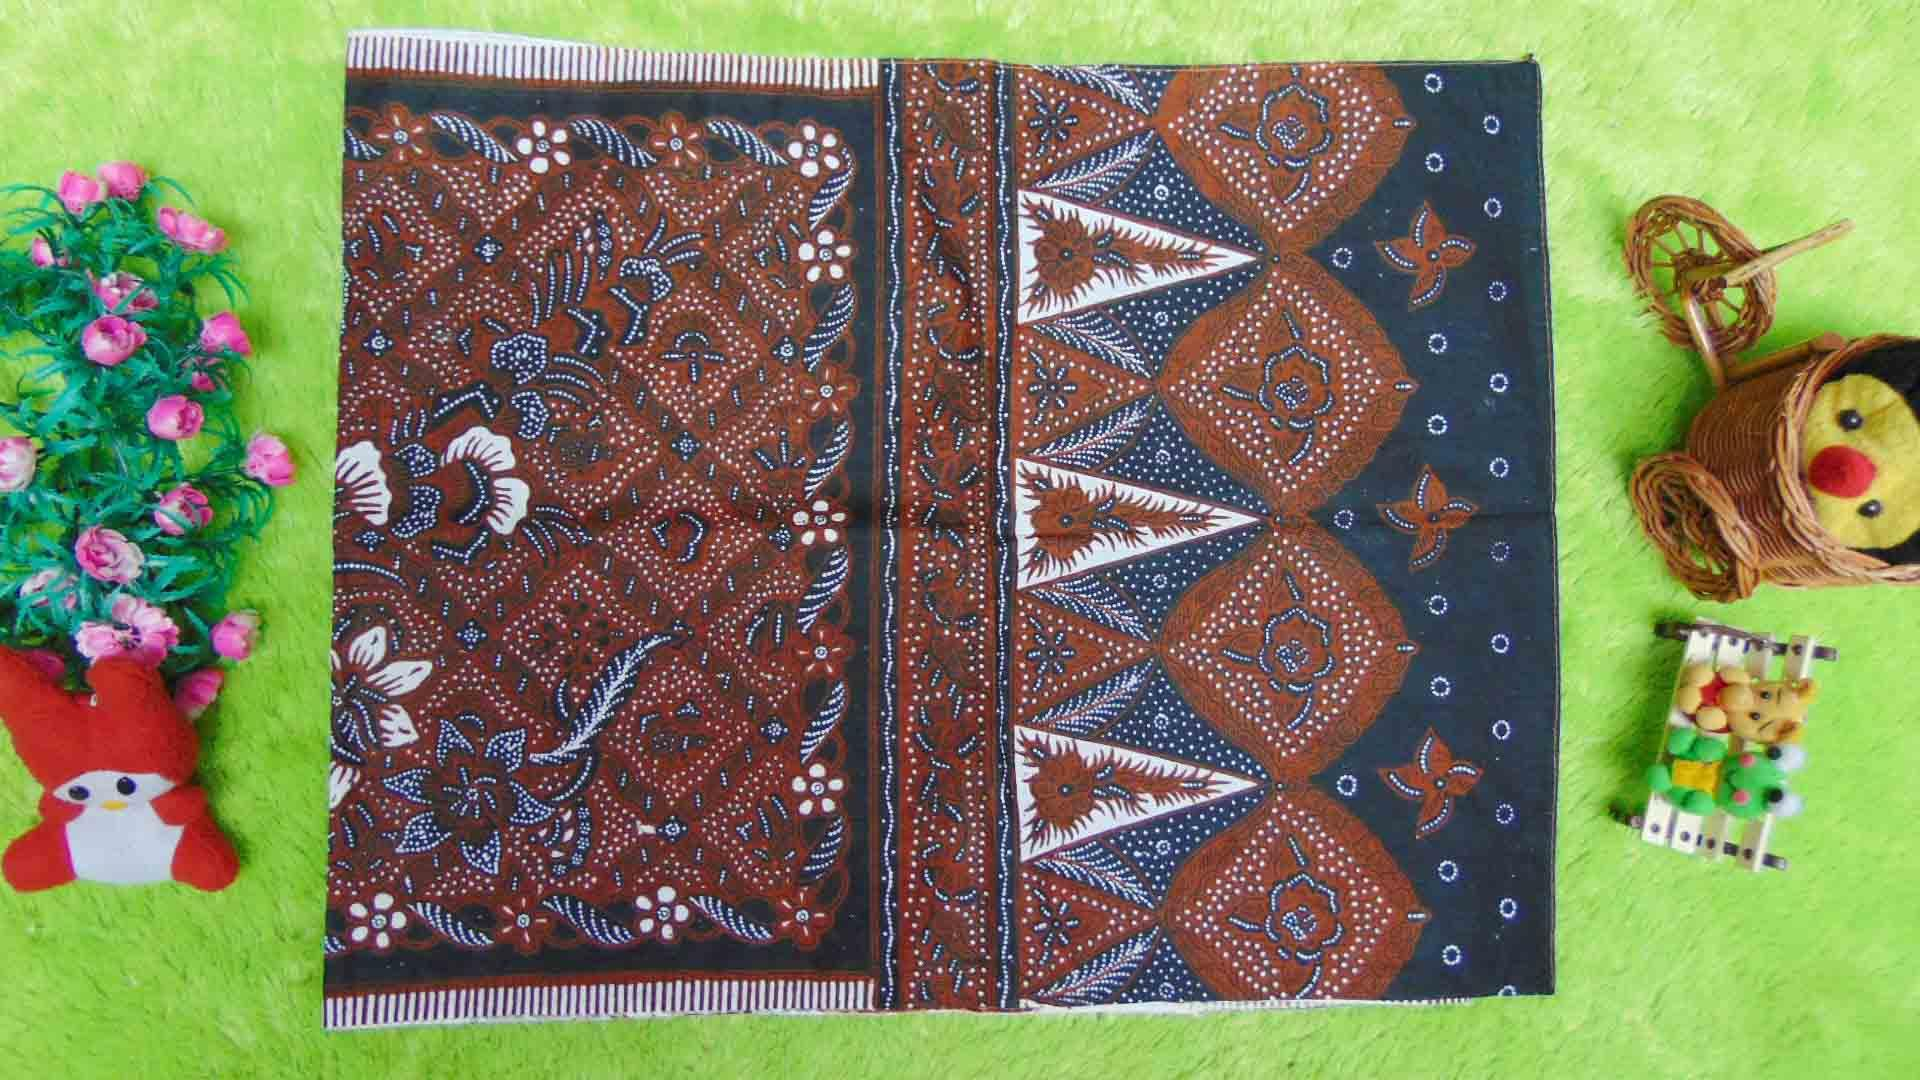 kembarshop - bedong batik bayi super jumbo memanjang motif random acak